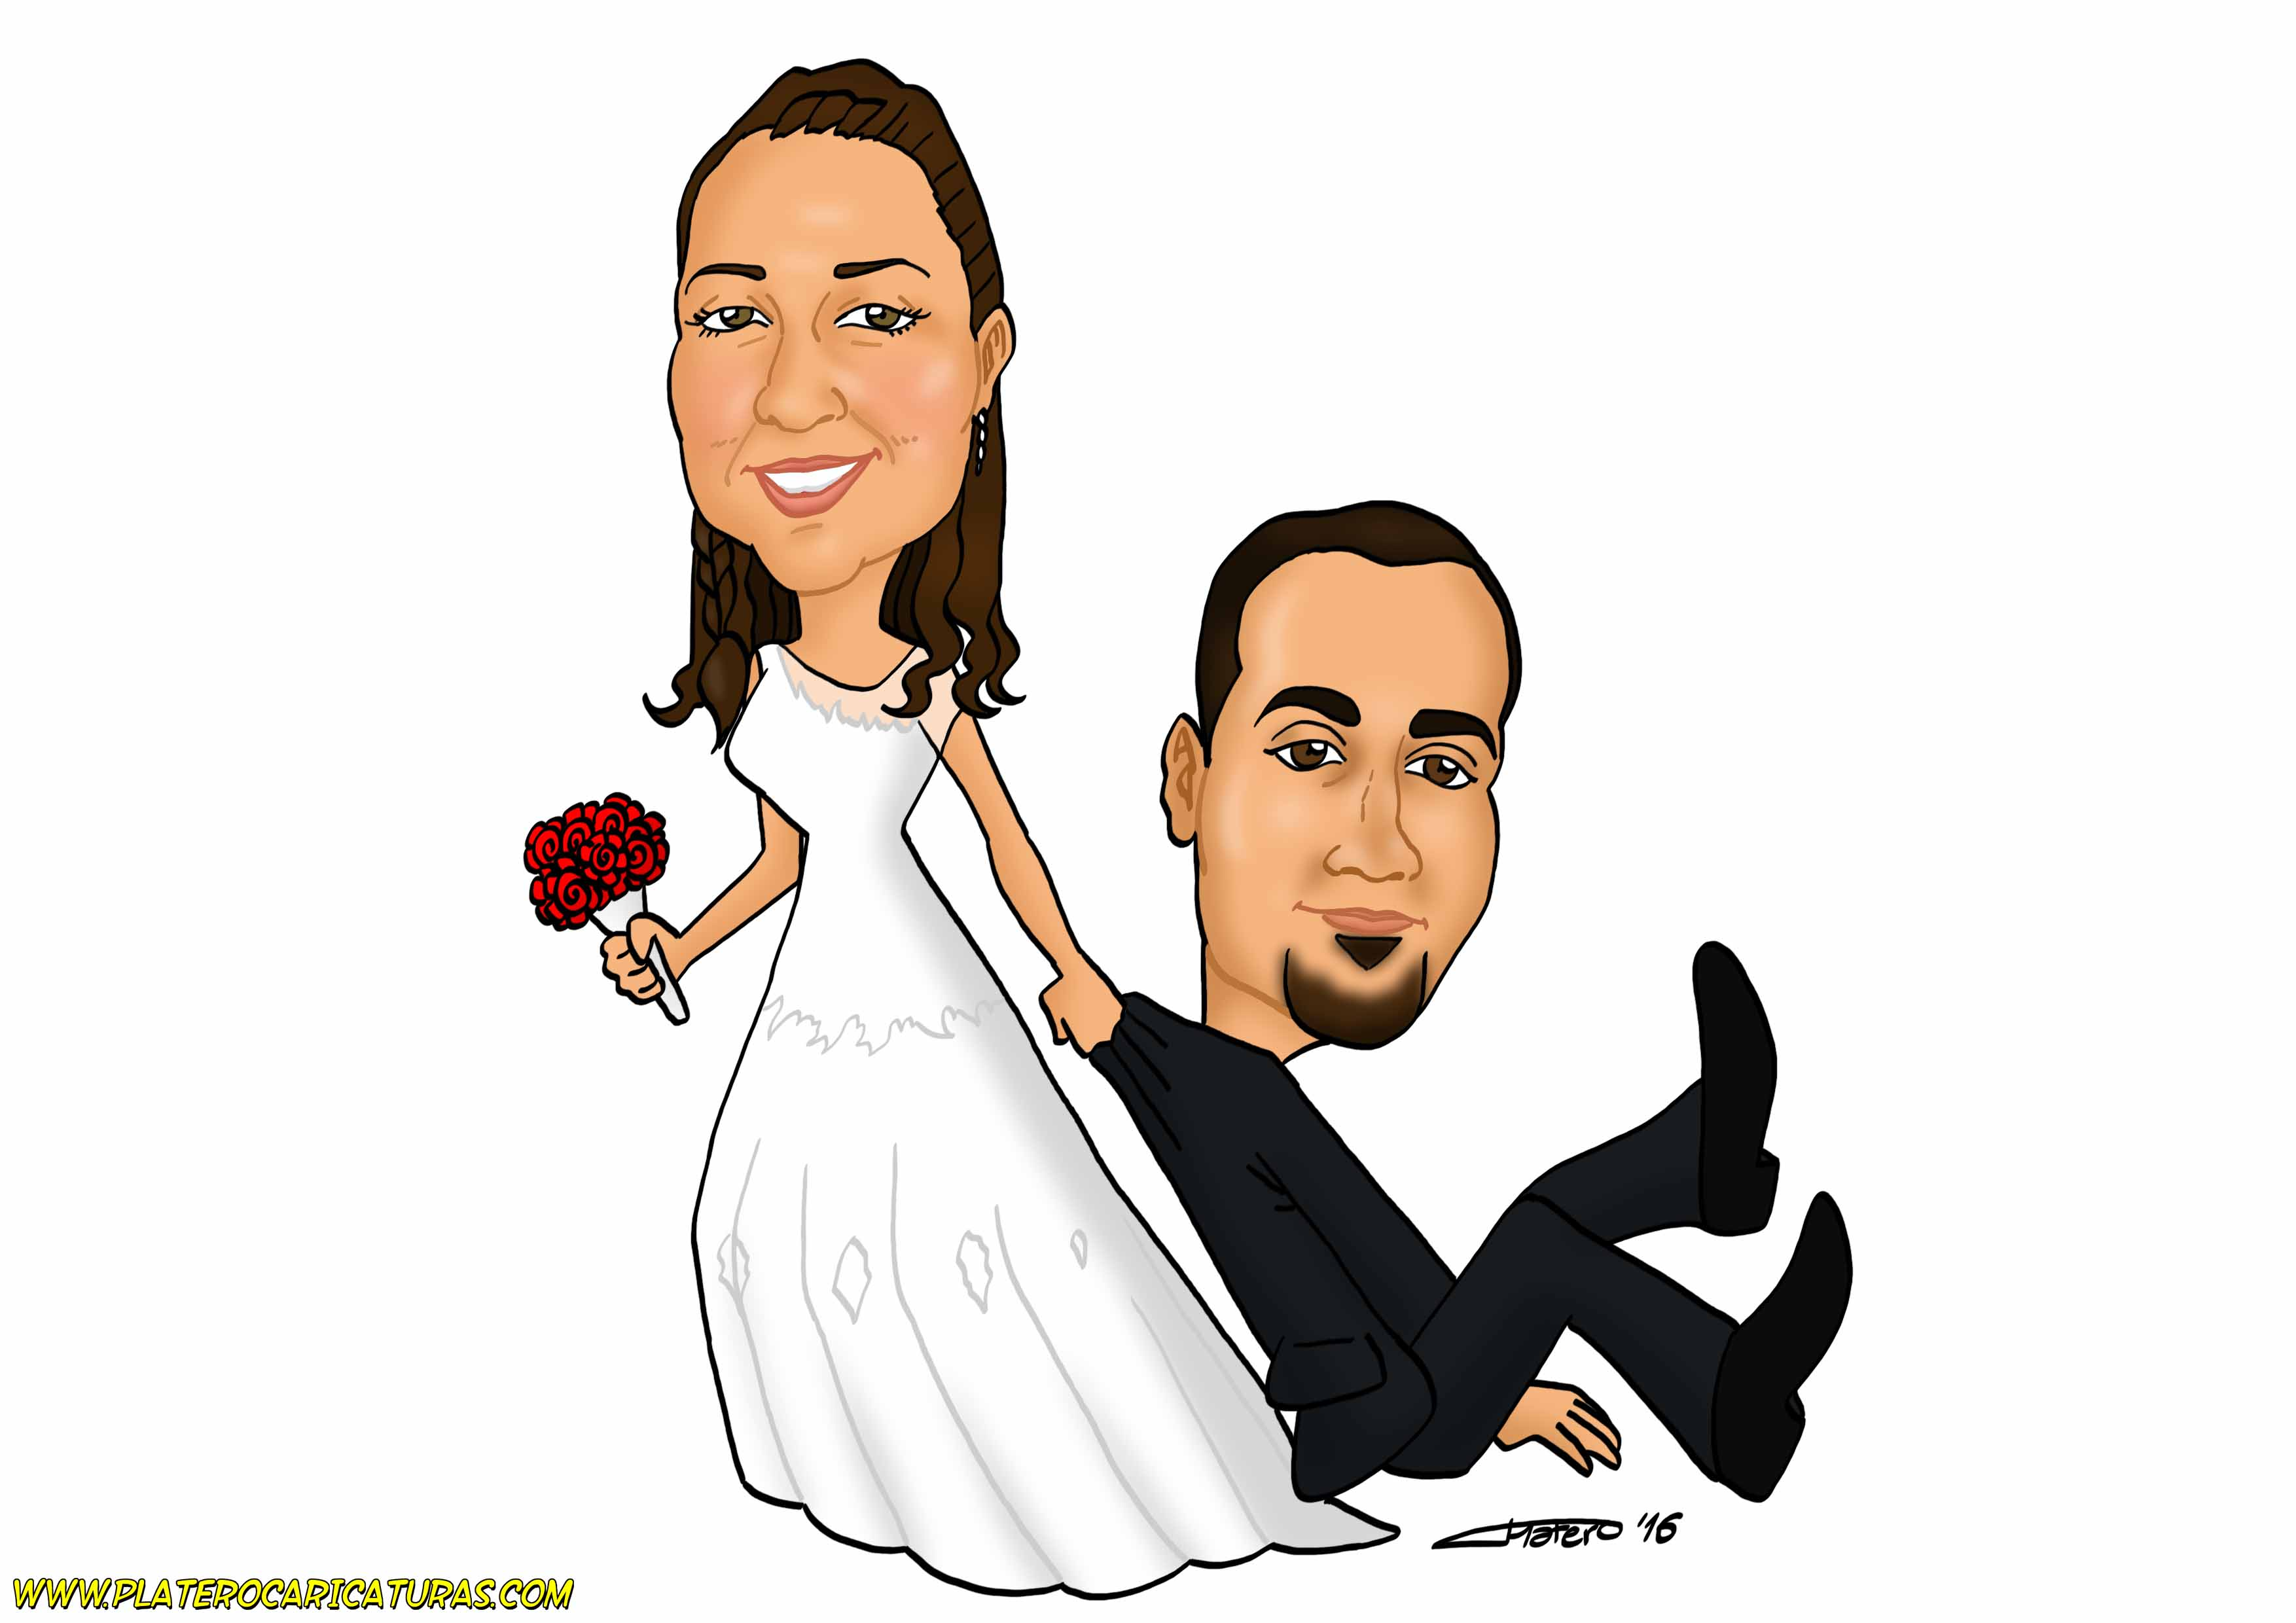 02_caricaturas_a_color_por_encargo_personalizadas_pareja_de_novios_tarjeta_boda_platerocaricaturas_e